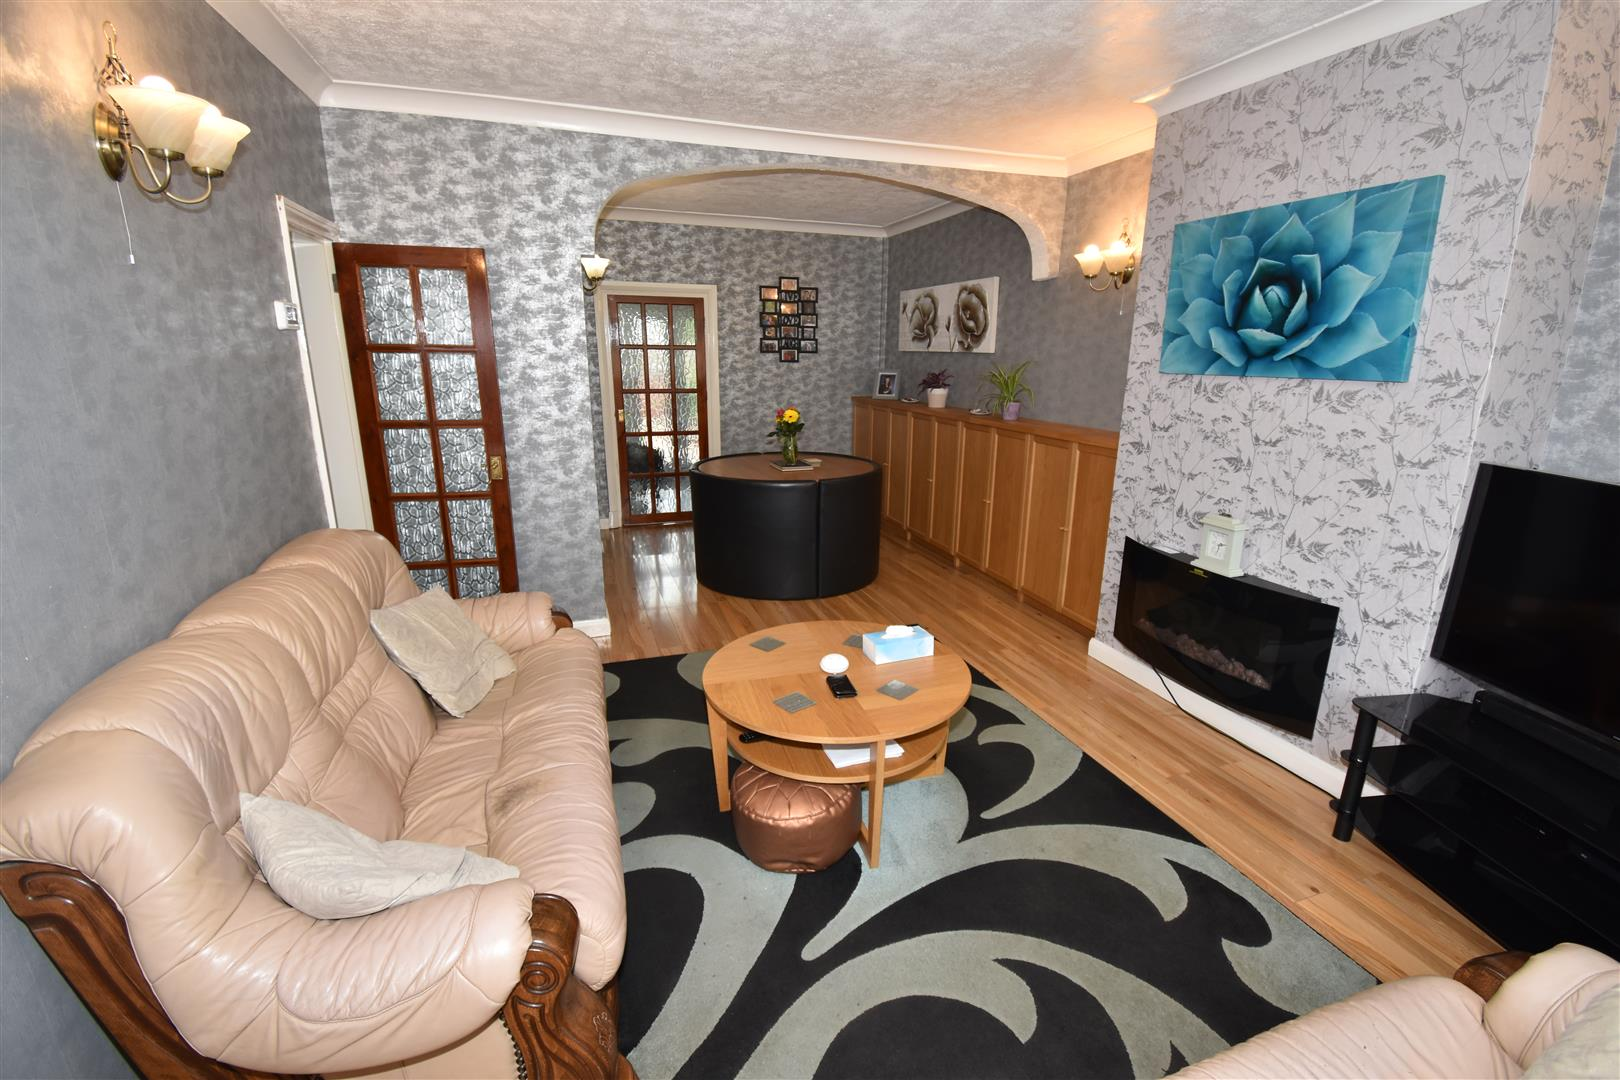 3 bed house for sale in Drews Lane, Birmingham B8 2SL 5